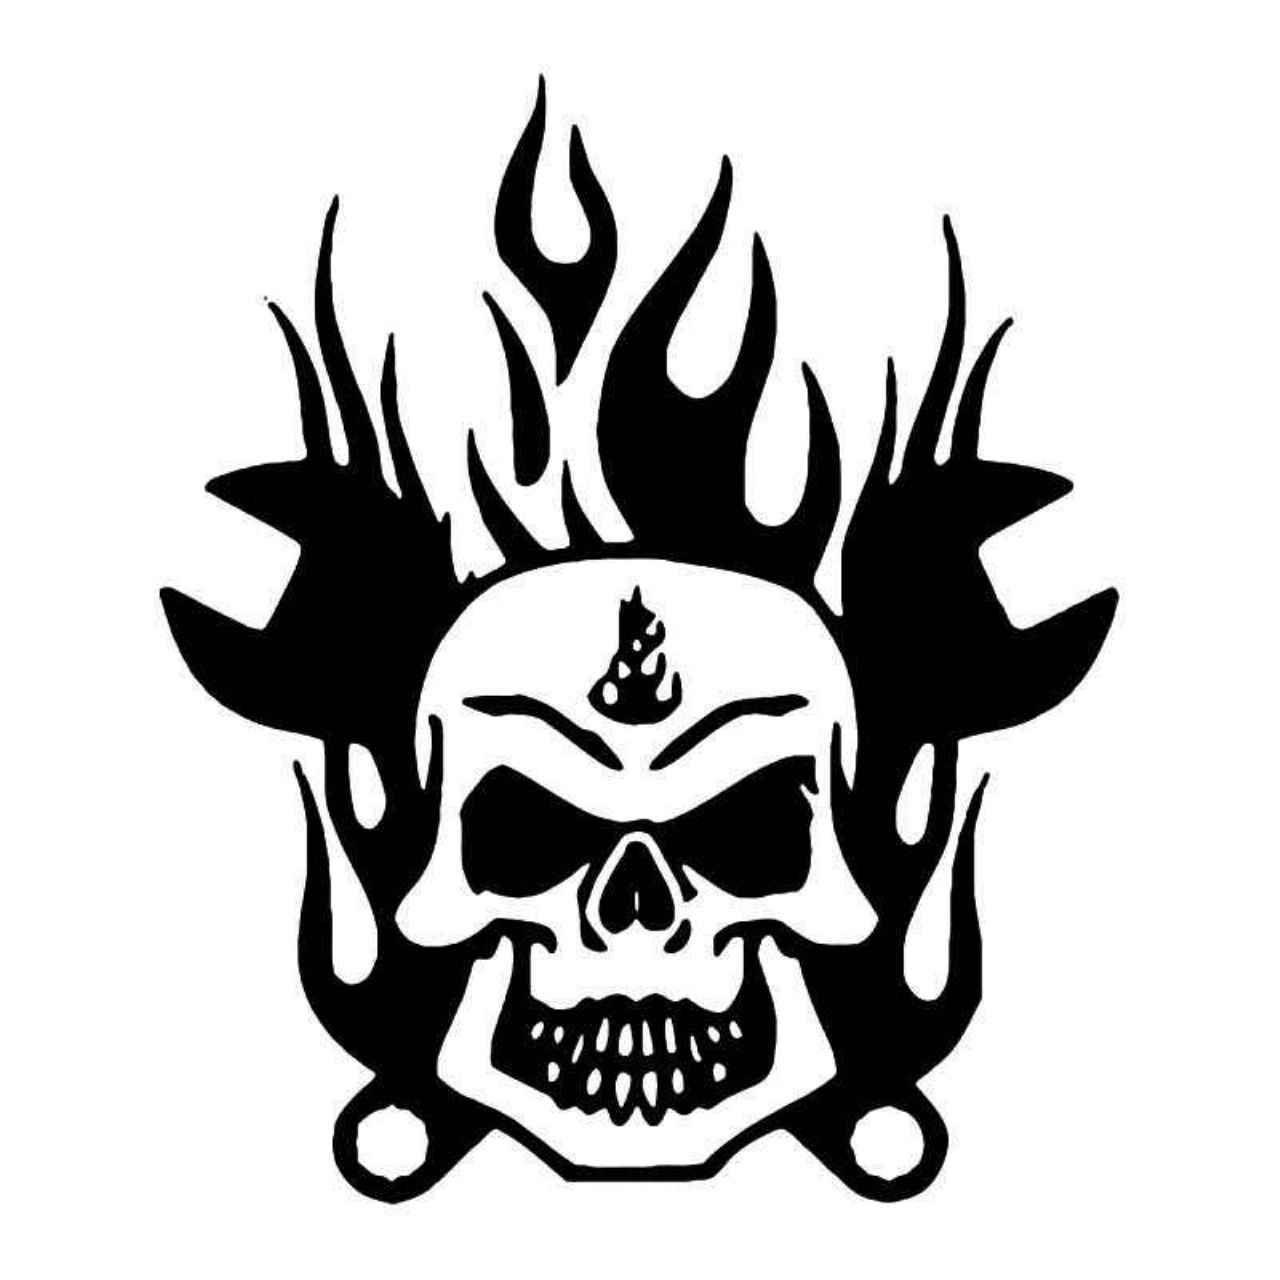 Skull Flame Wrenches Vinyl Decal Sticker Ballzbeatz Com